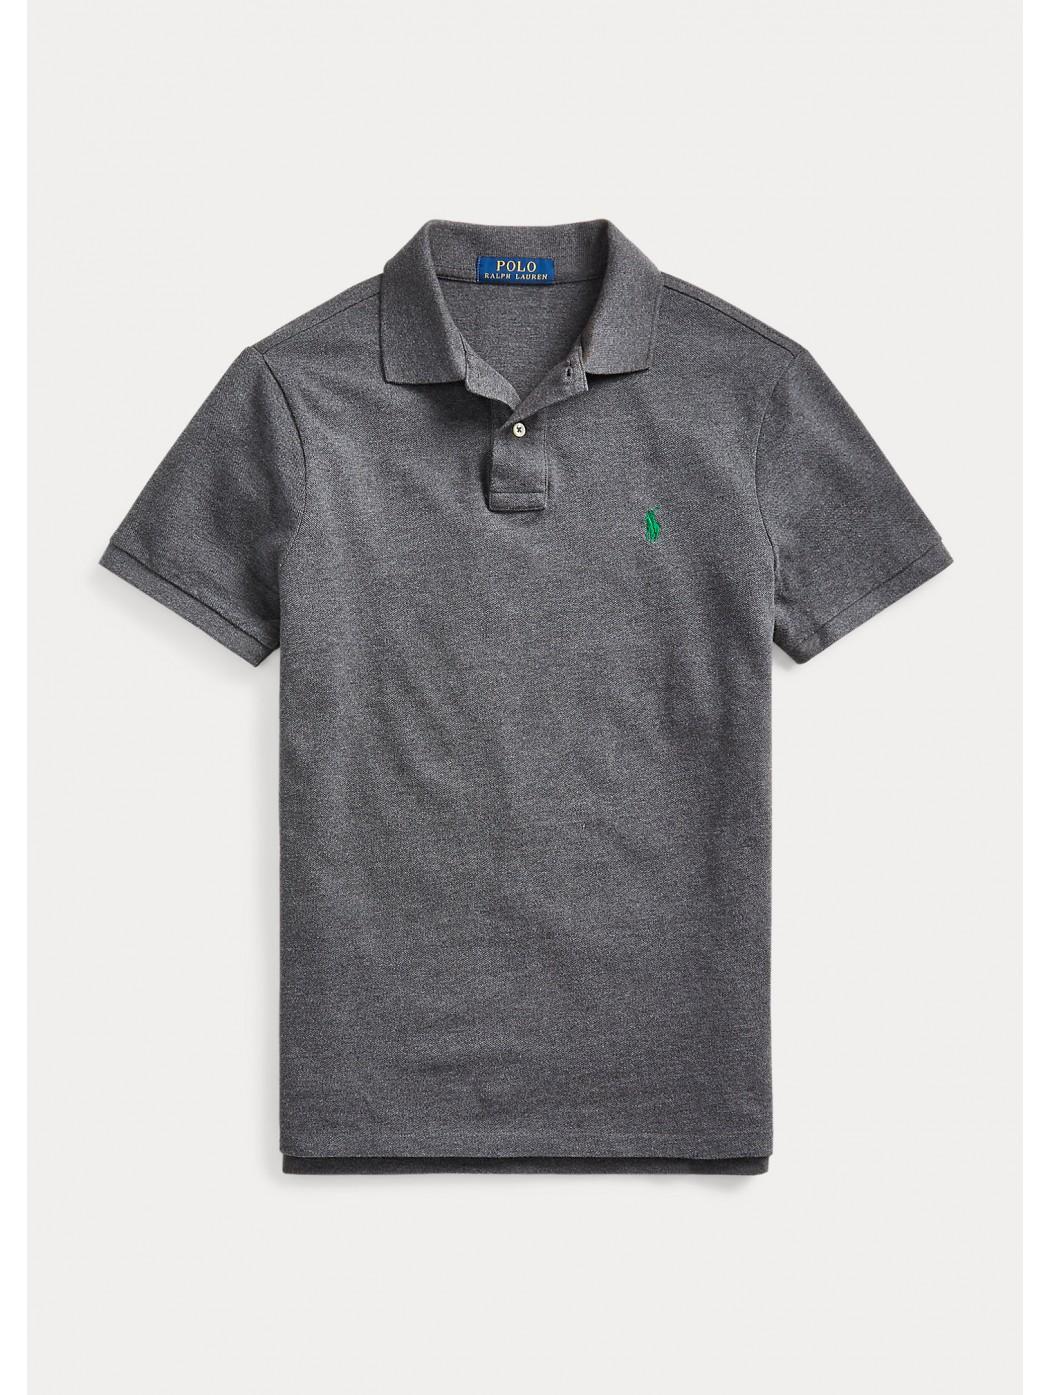 Polo in piqu' Slim-Fit POLO RALPH LAUREN UOMO 710795080 008